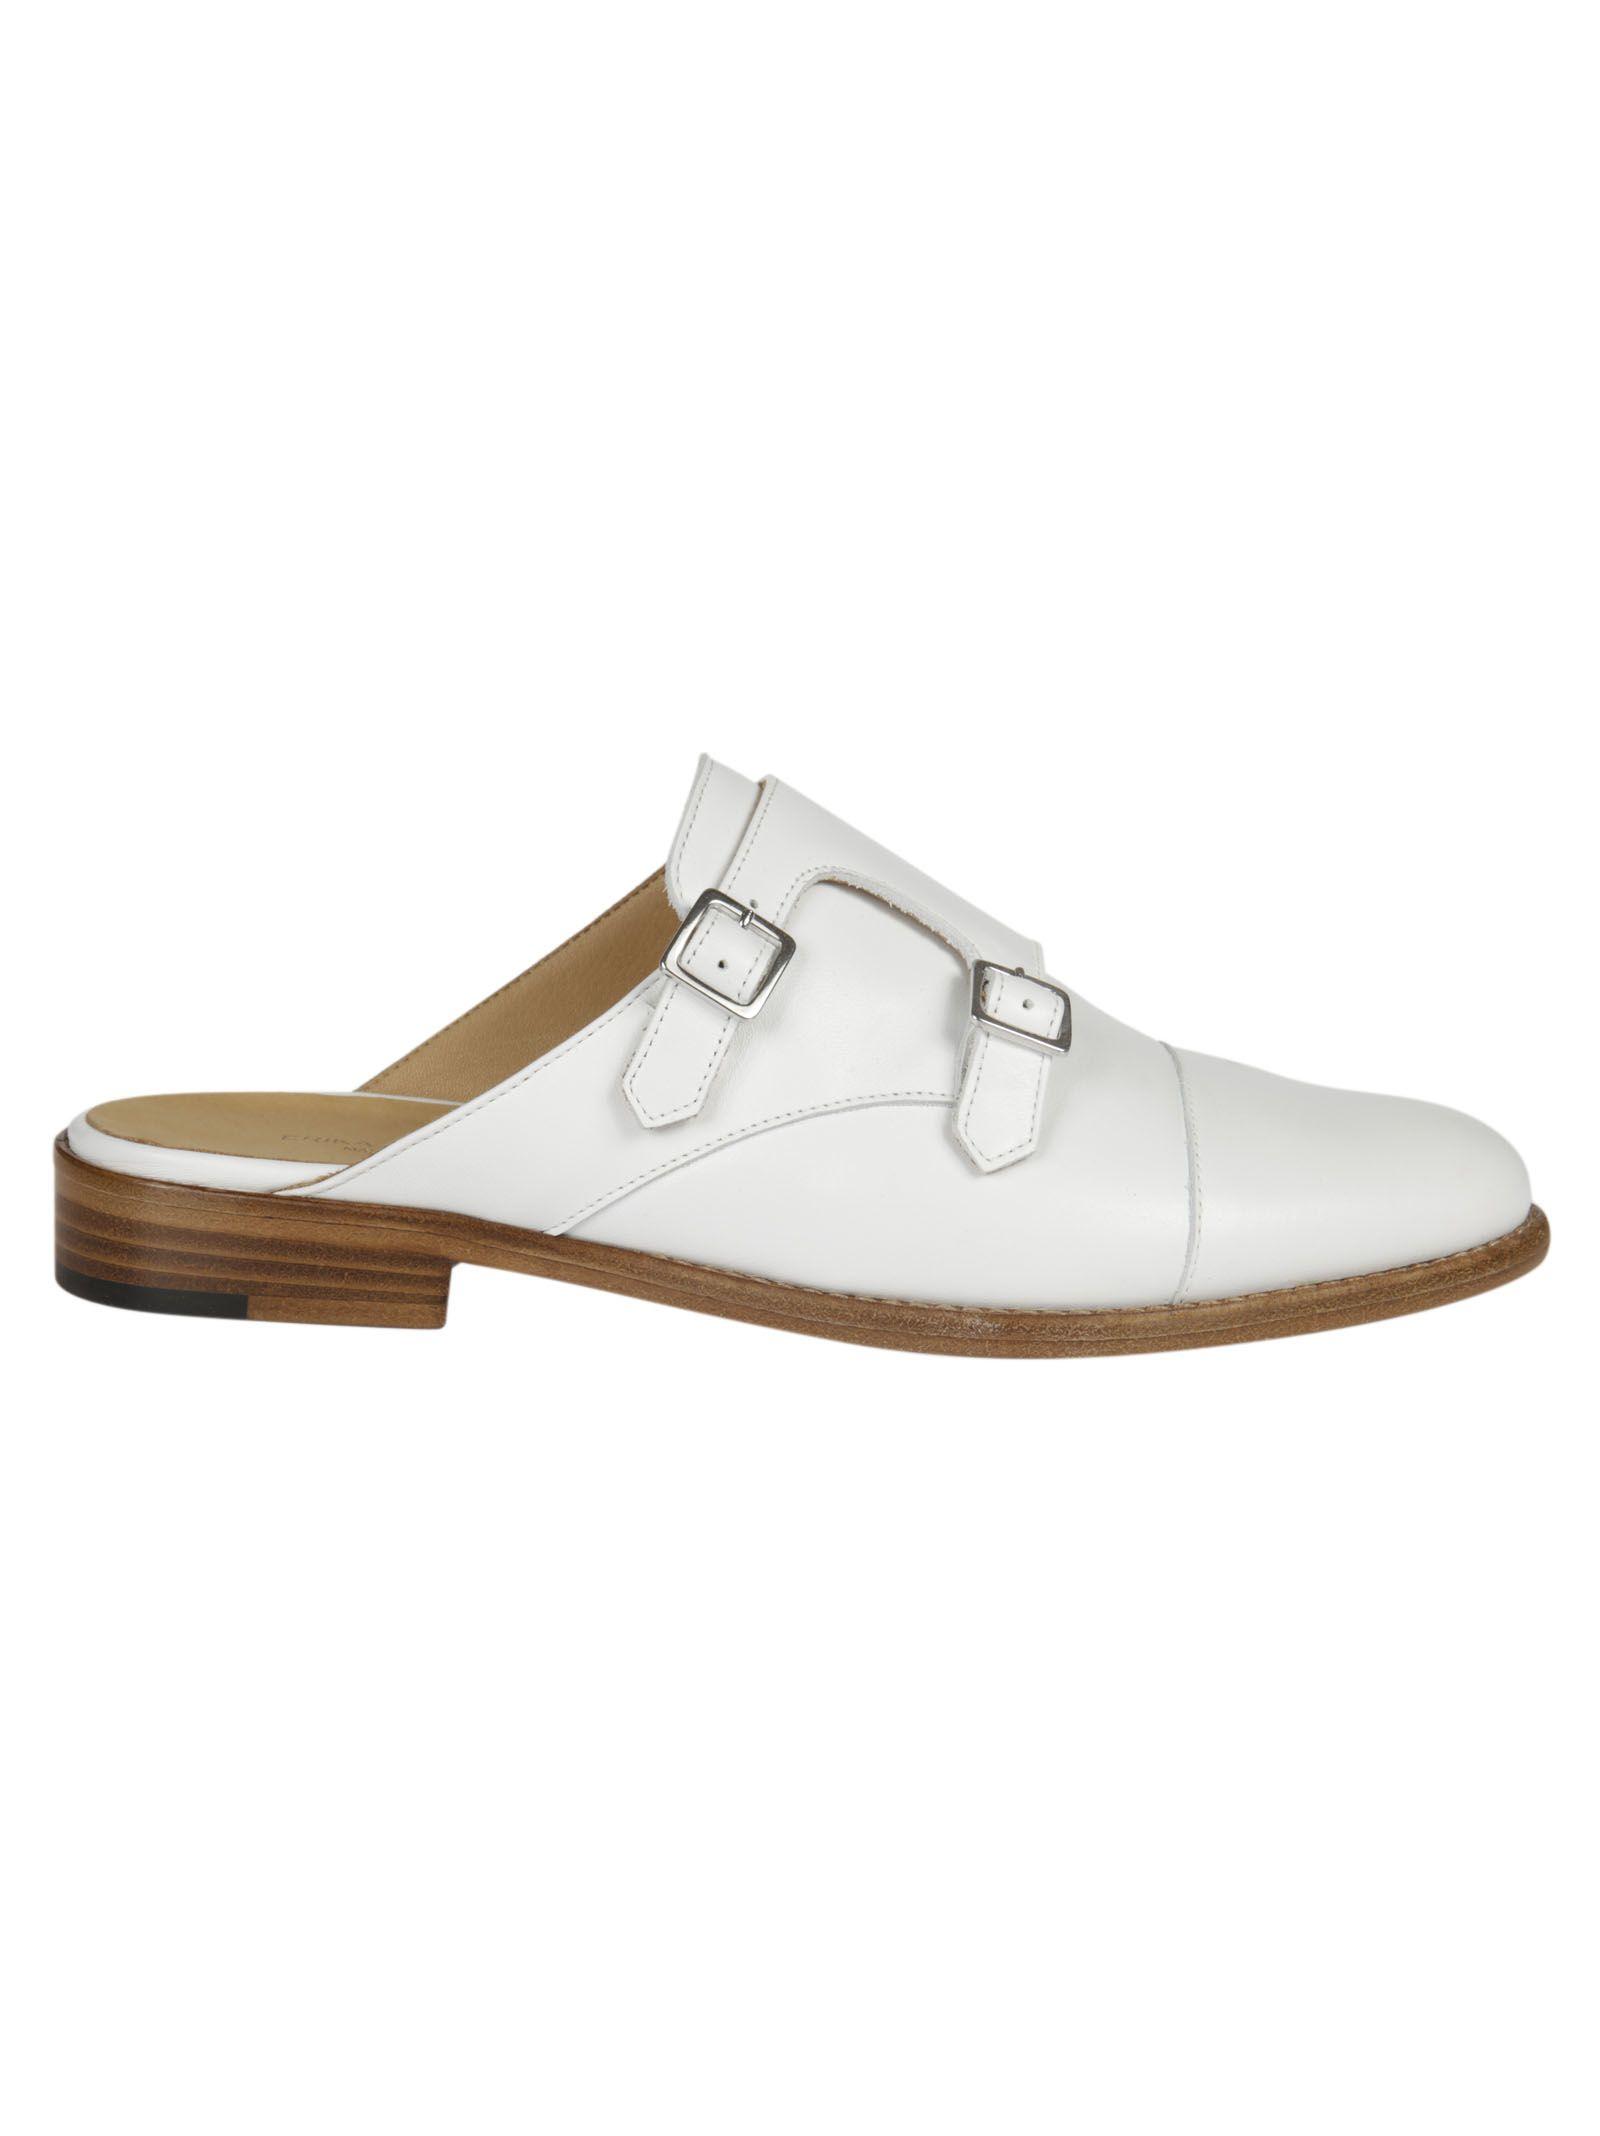 Erika Cavallini Buckled Monk Shoes